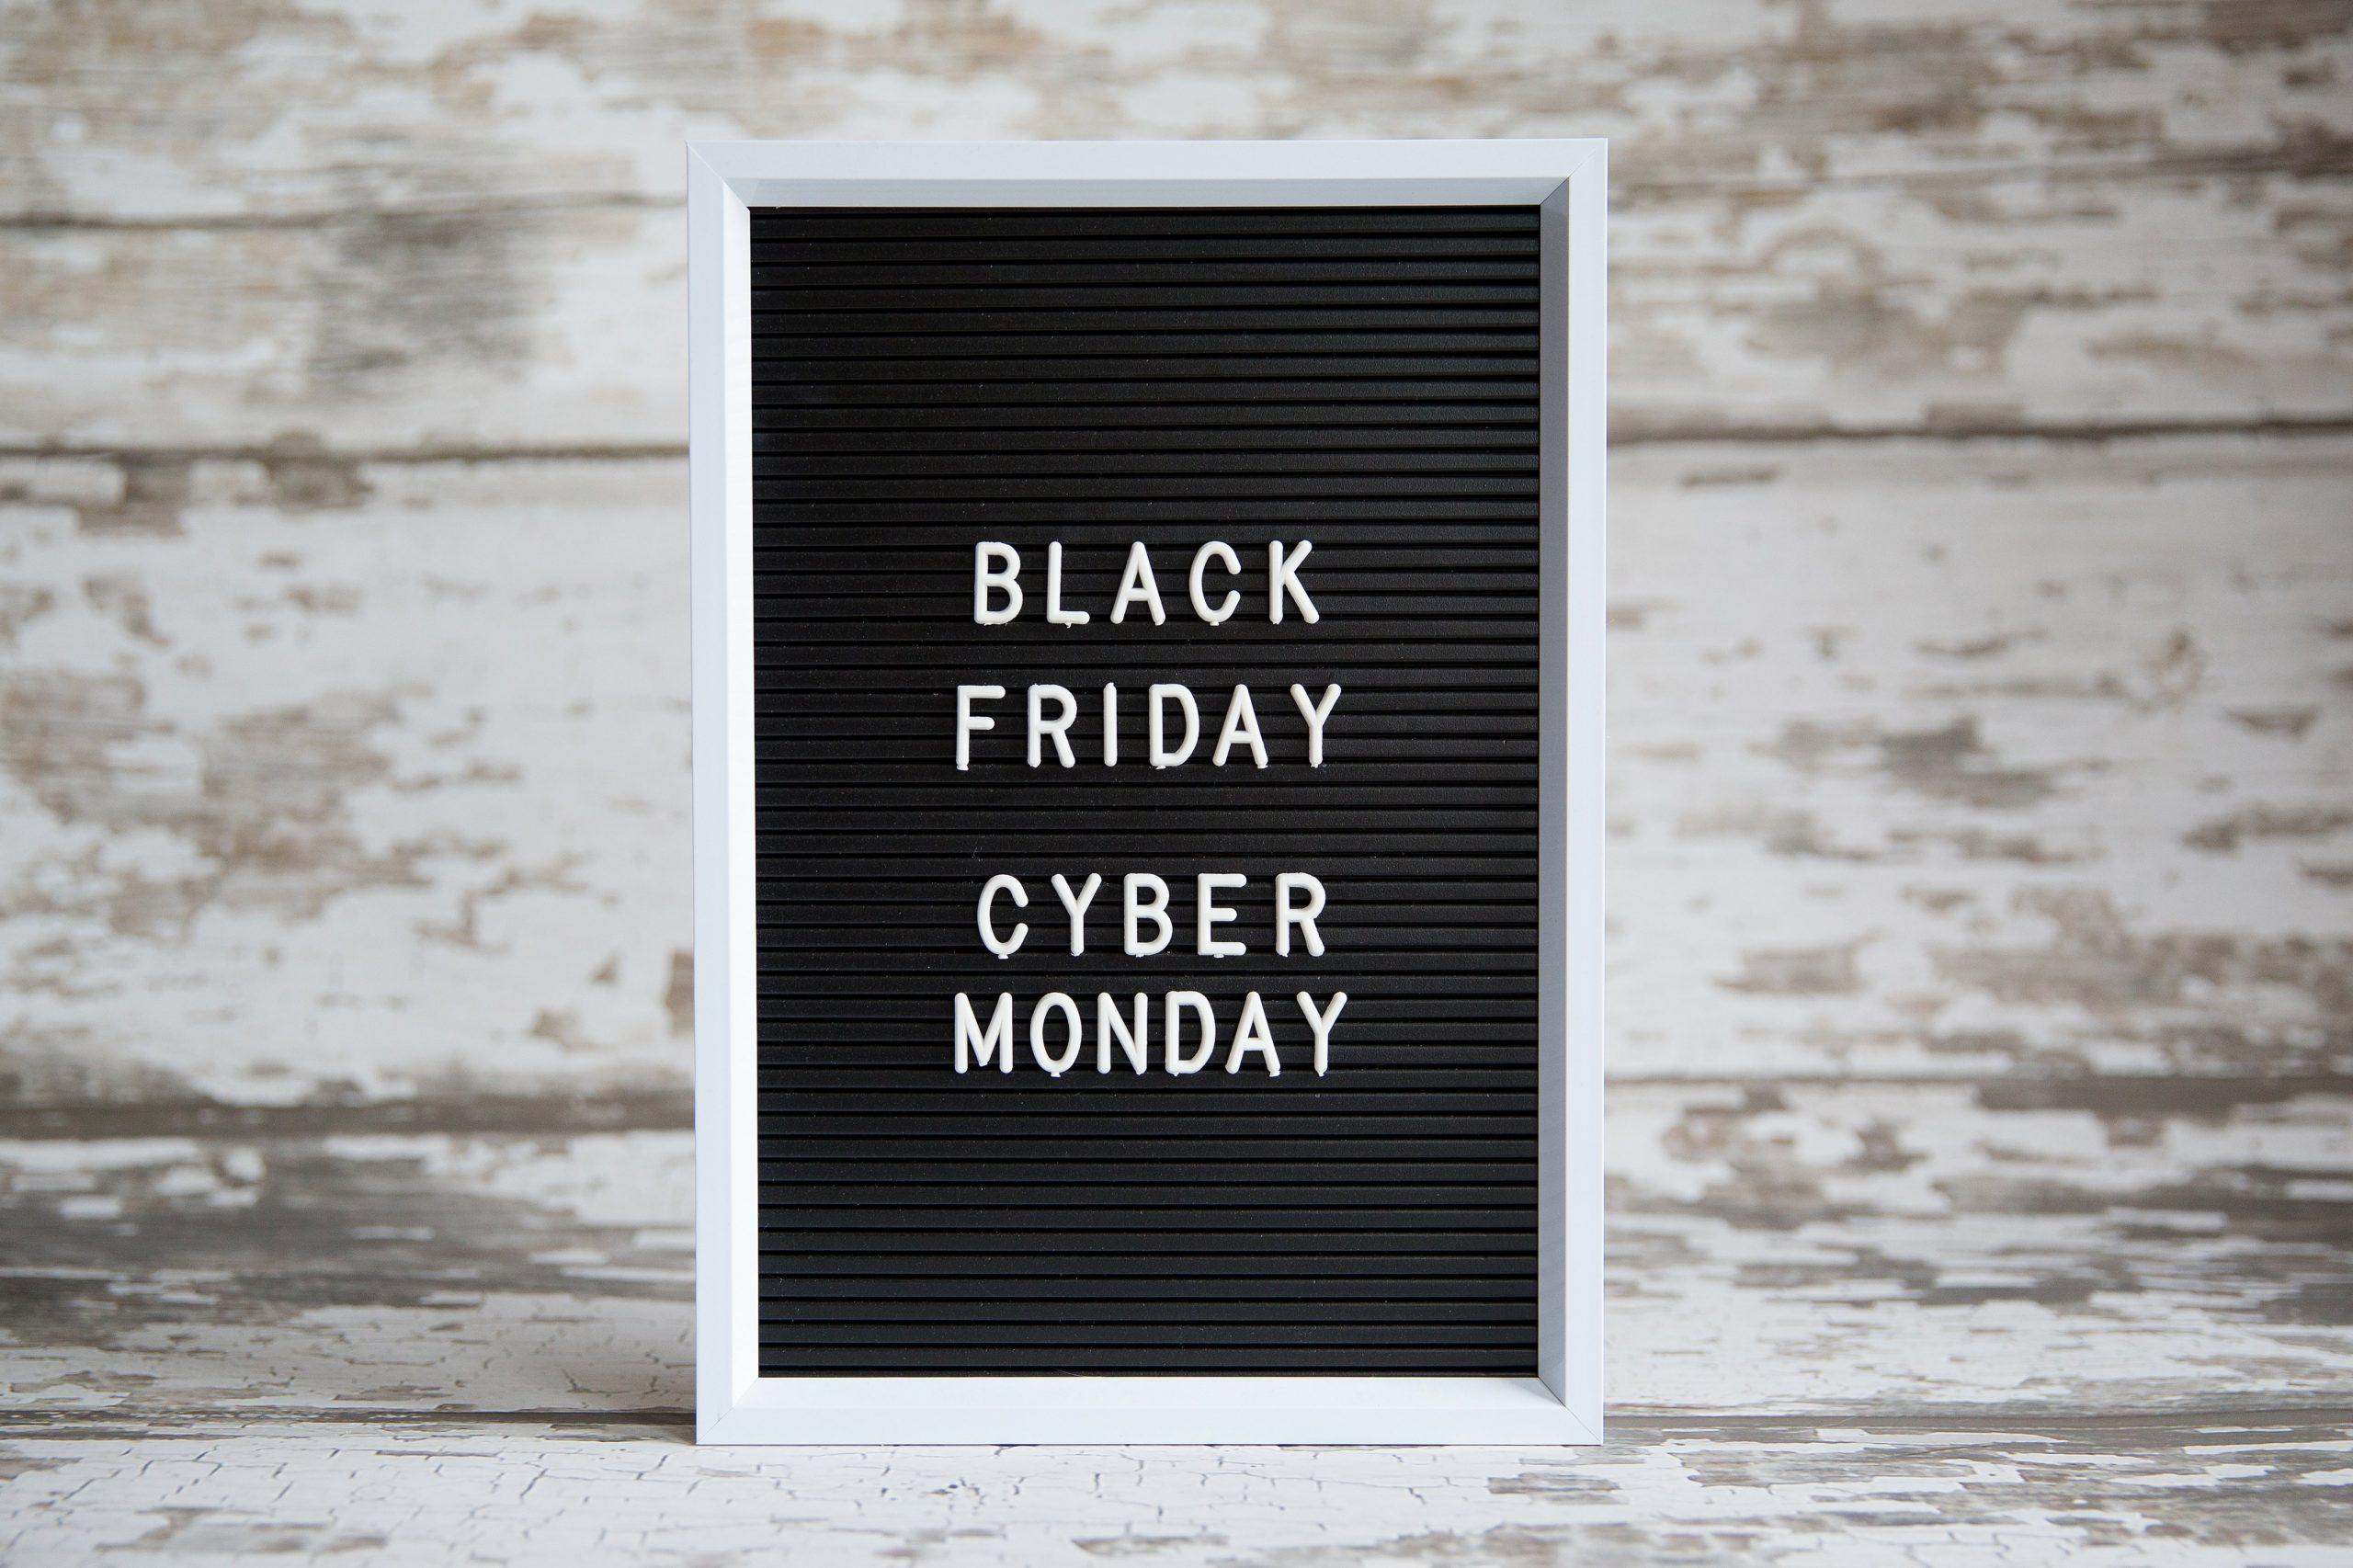 Black Friday/Cyber Monday